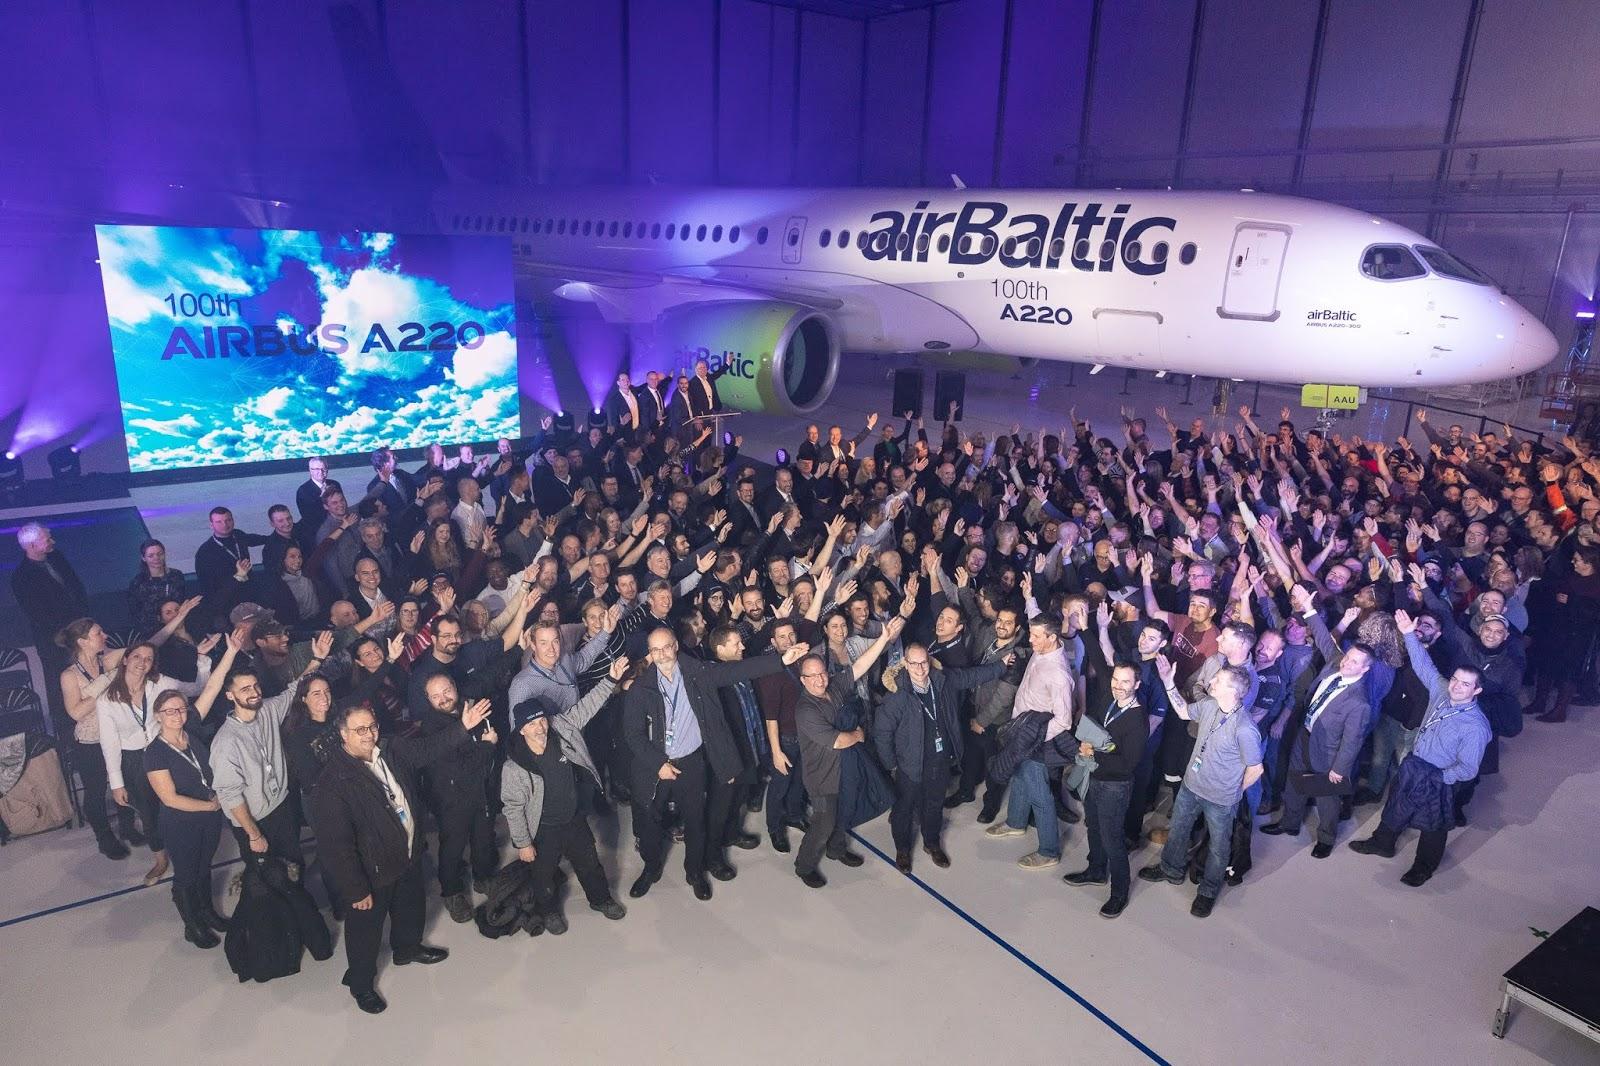 Airbus comemora a 100ª aeronave A220 produzida | É MWIS QUE VOAR